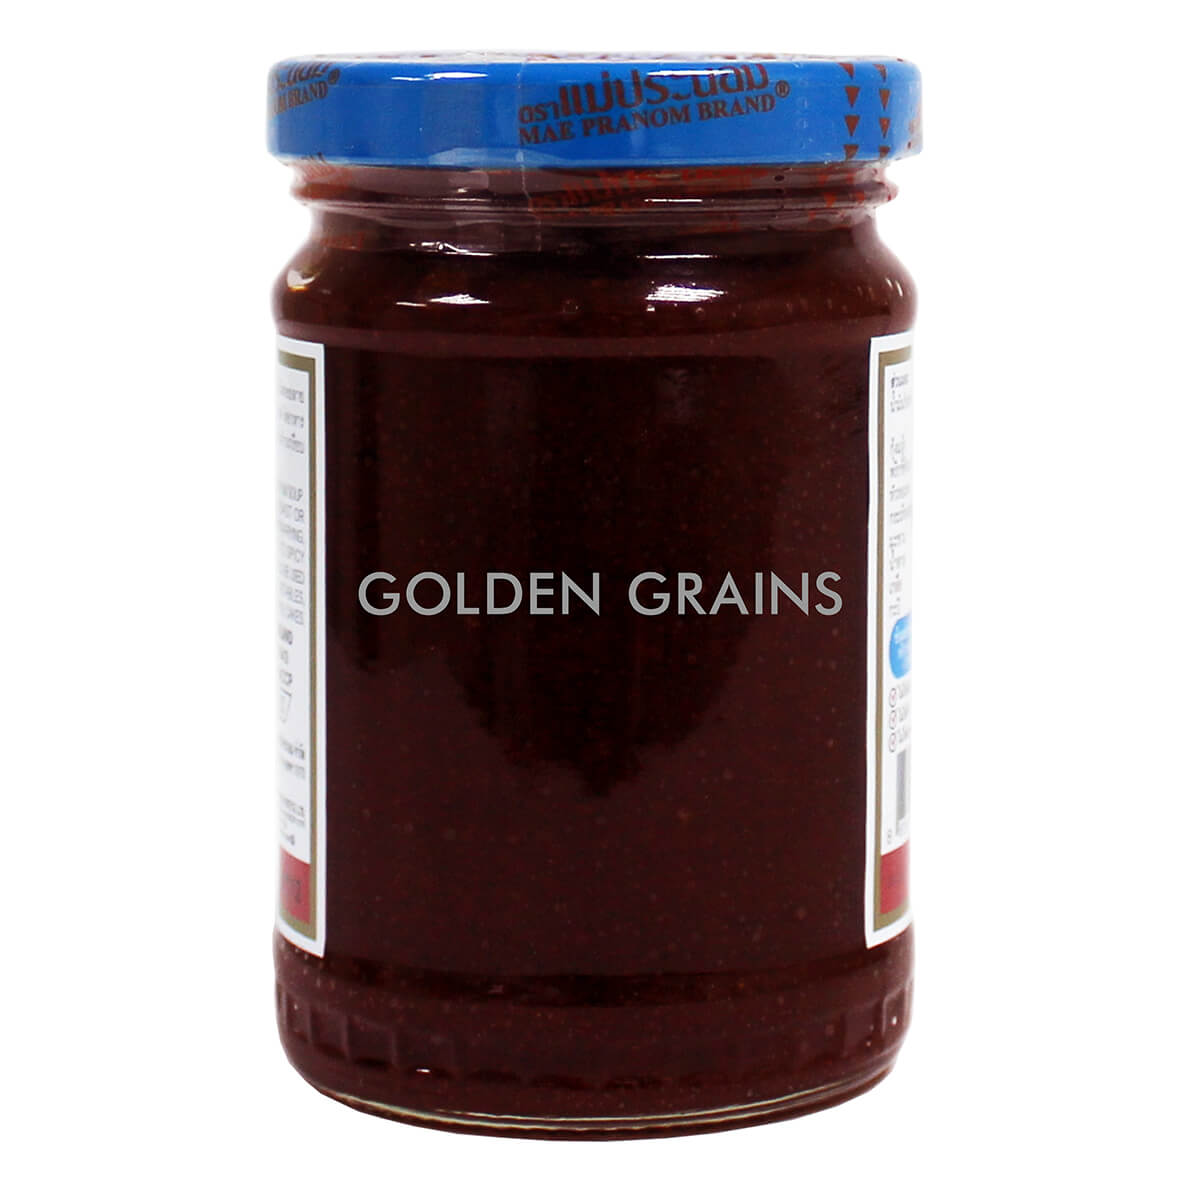 Golden Grains Dubai Export - Maepranom Brand - Thai Chili Paste - Back.jpg